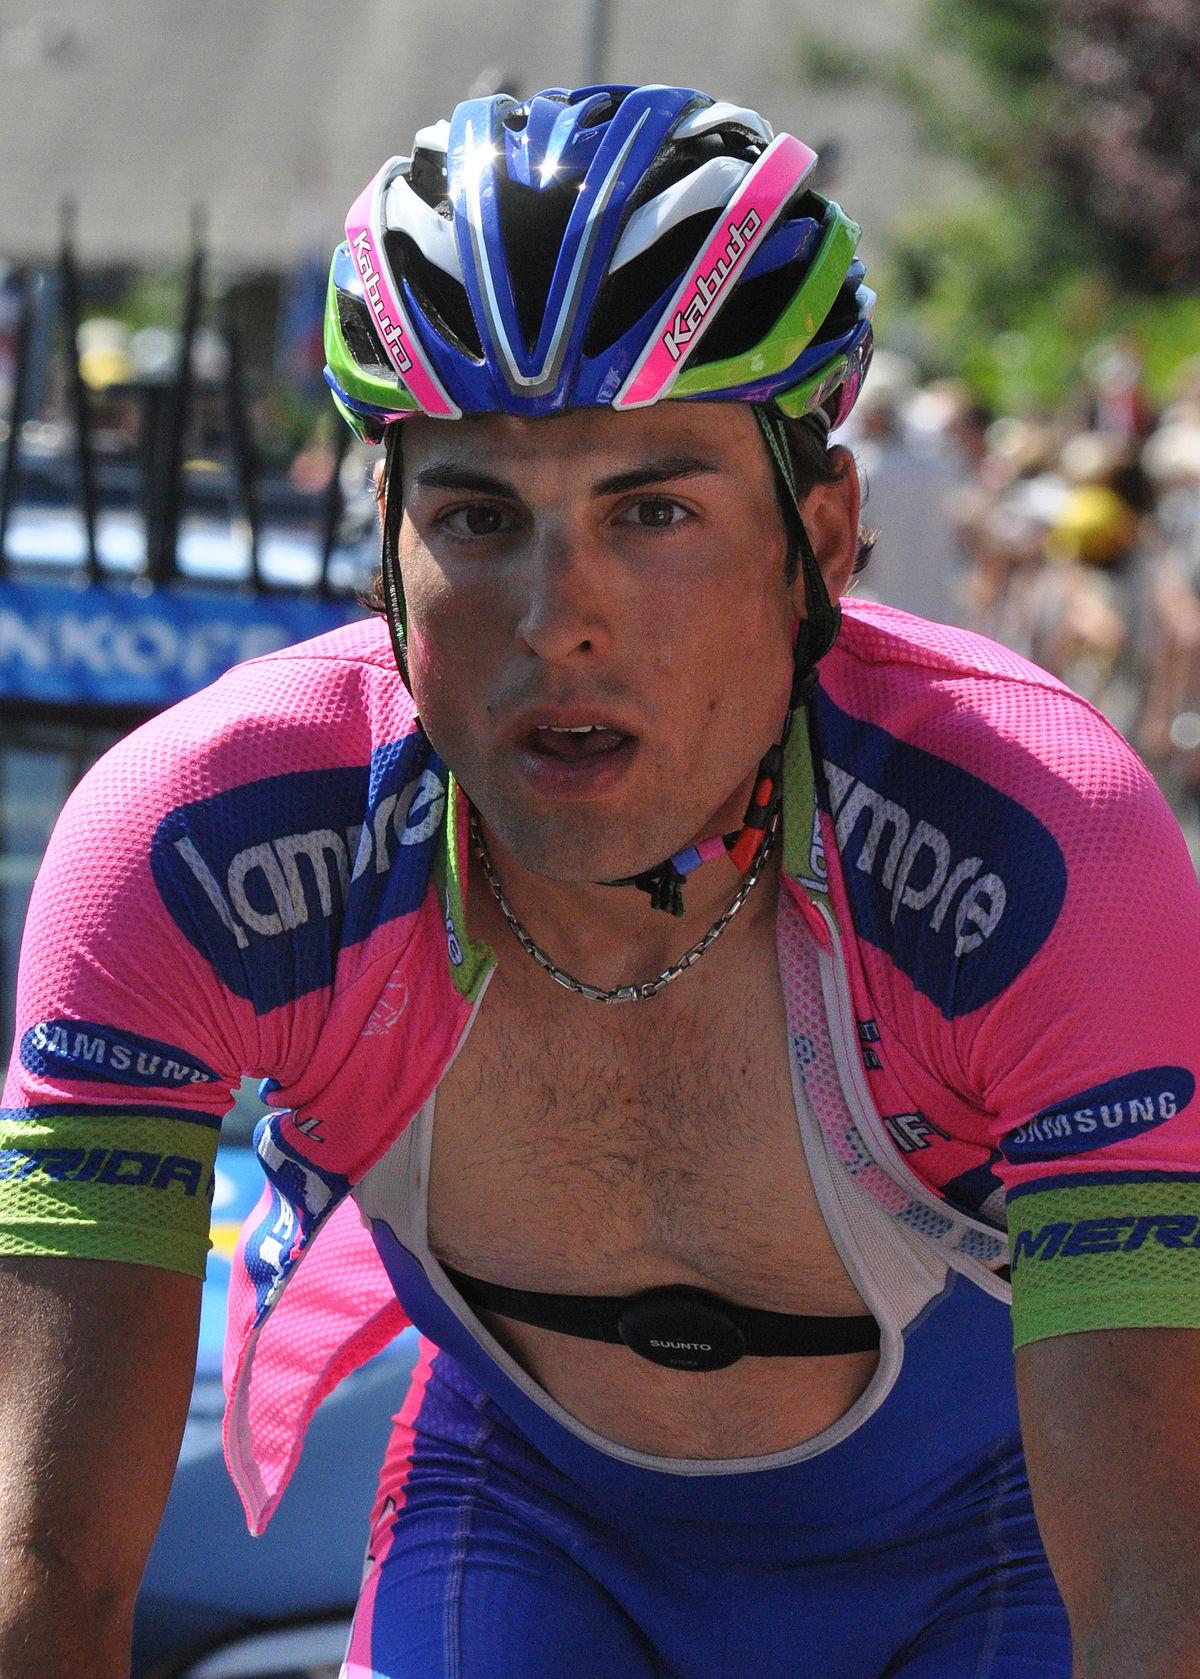 The Grand Tour Season 2 >> Davide Cimolai - Wikipedia